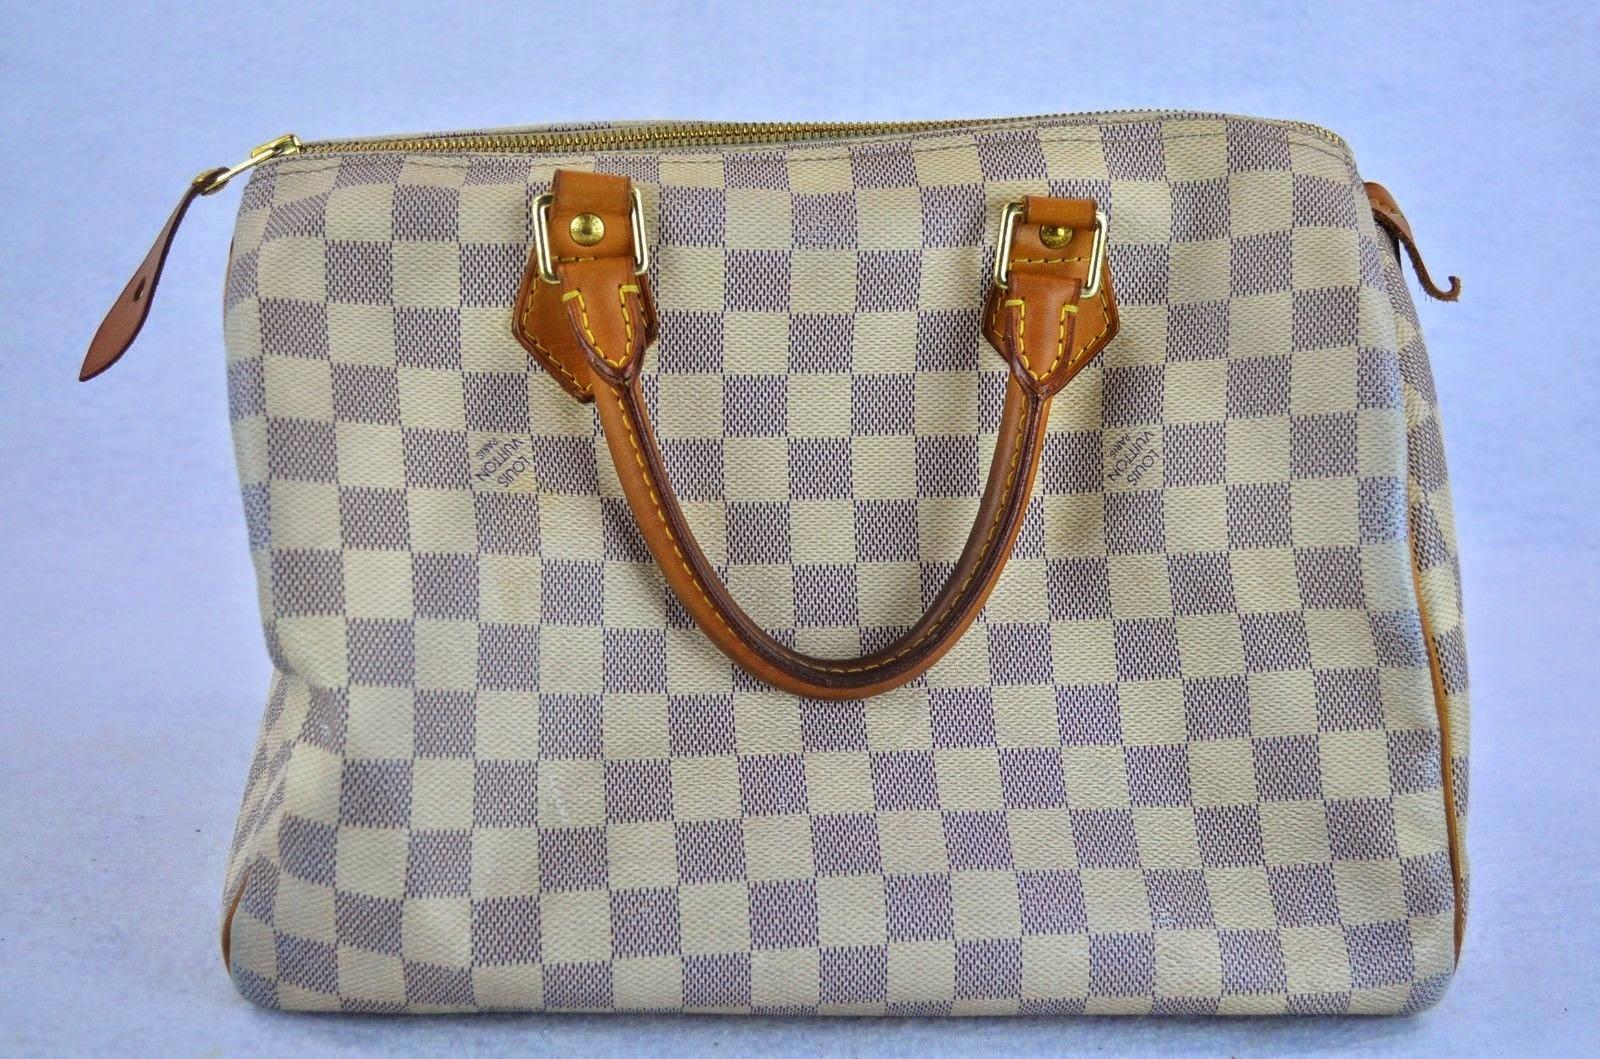 Item of the Week  Louis Vuitton Speedy 30 Damier Azur Canvas Handbag ~ Le  Thrift Consignment 8c228c63518d4